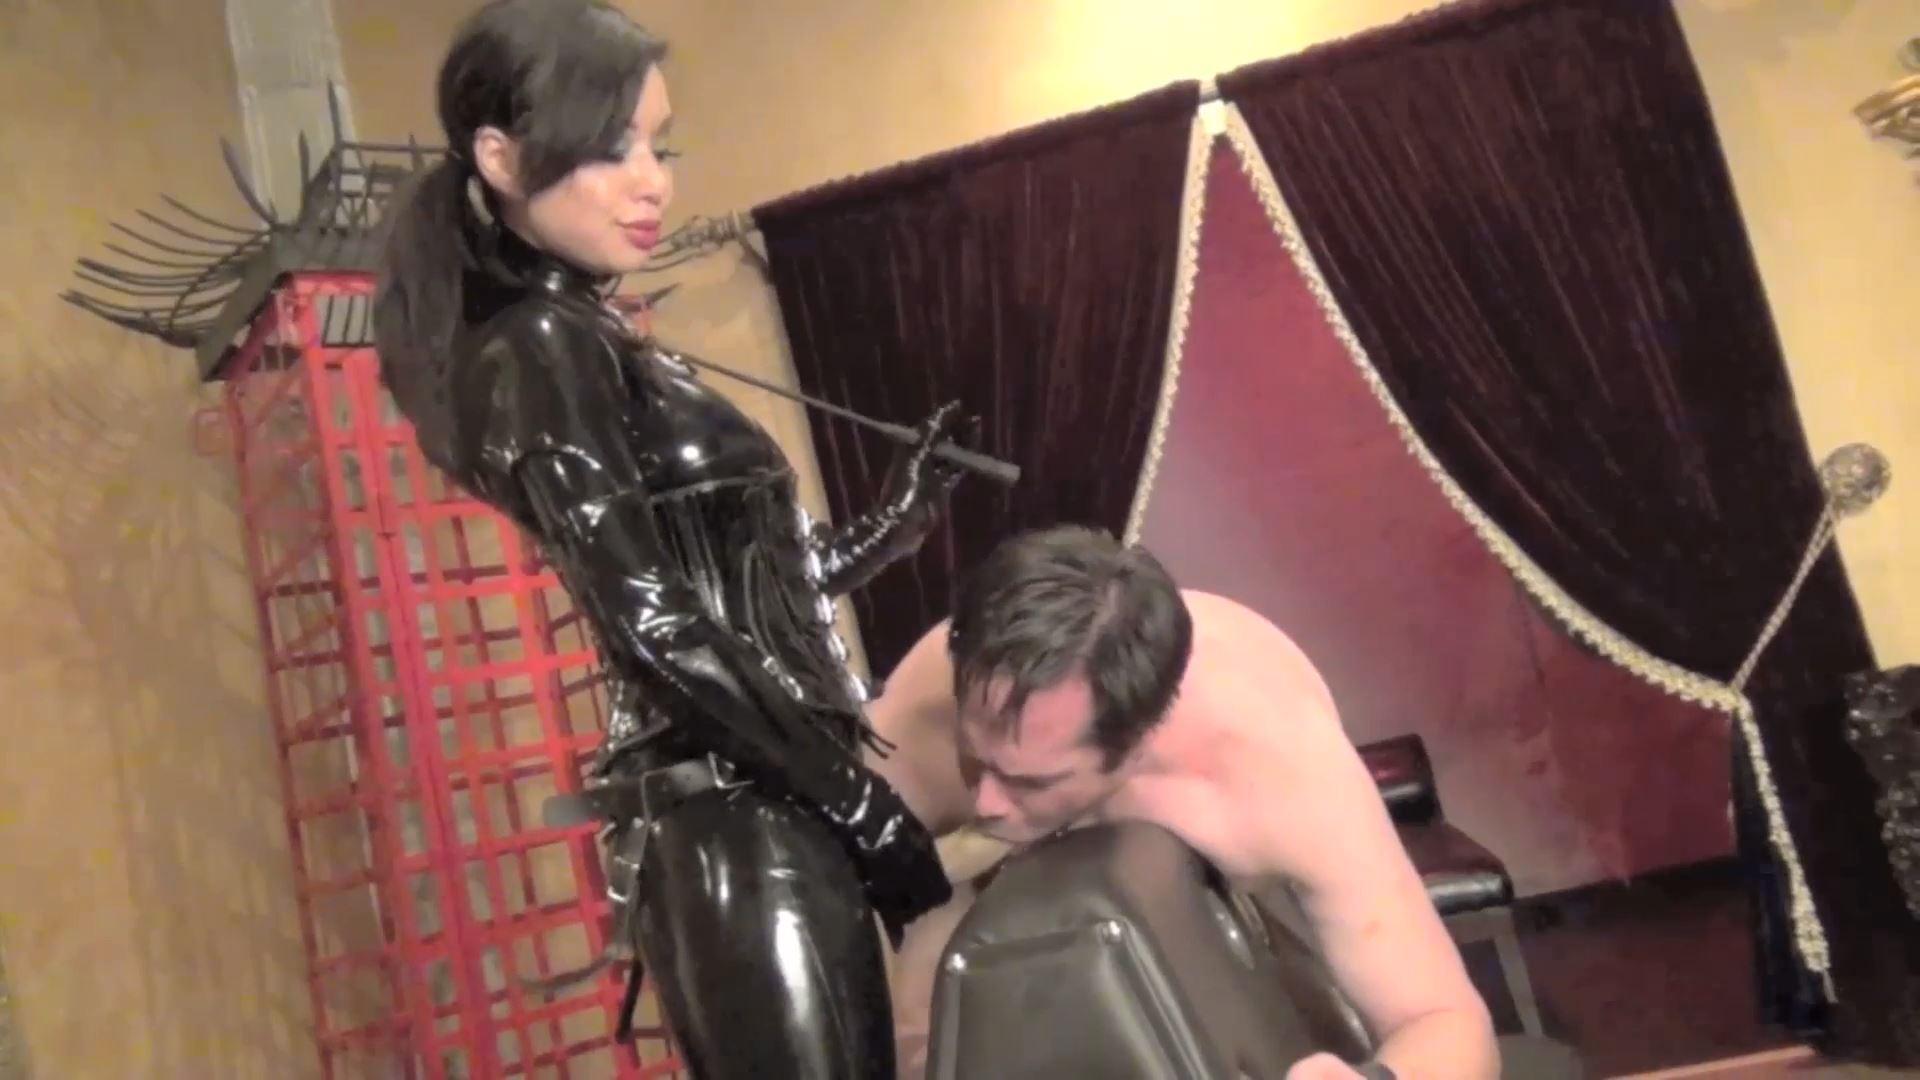 Mistress Kim In Scene: EAT YOURE SHYT BITCH! - DOMNATION - FULL HD/1080p/MP4